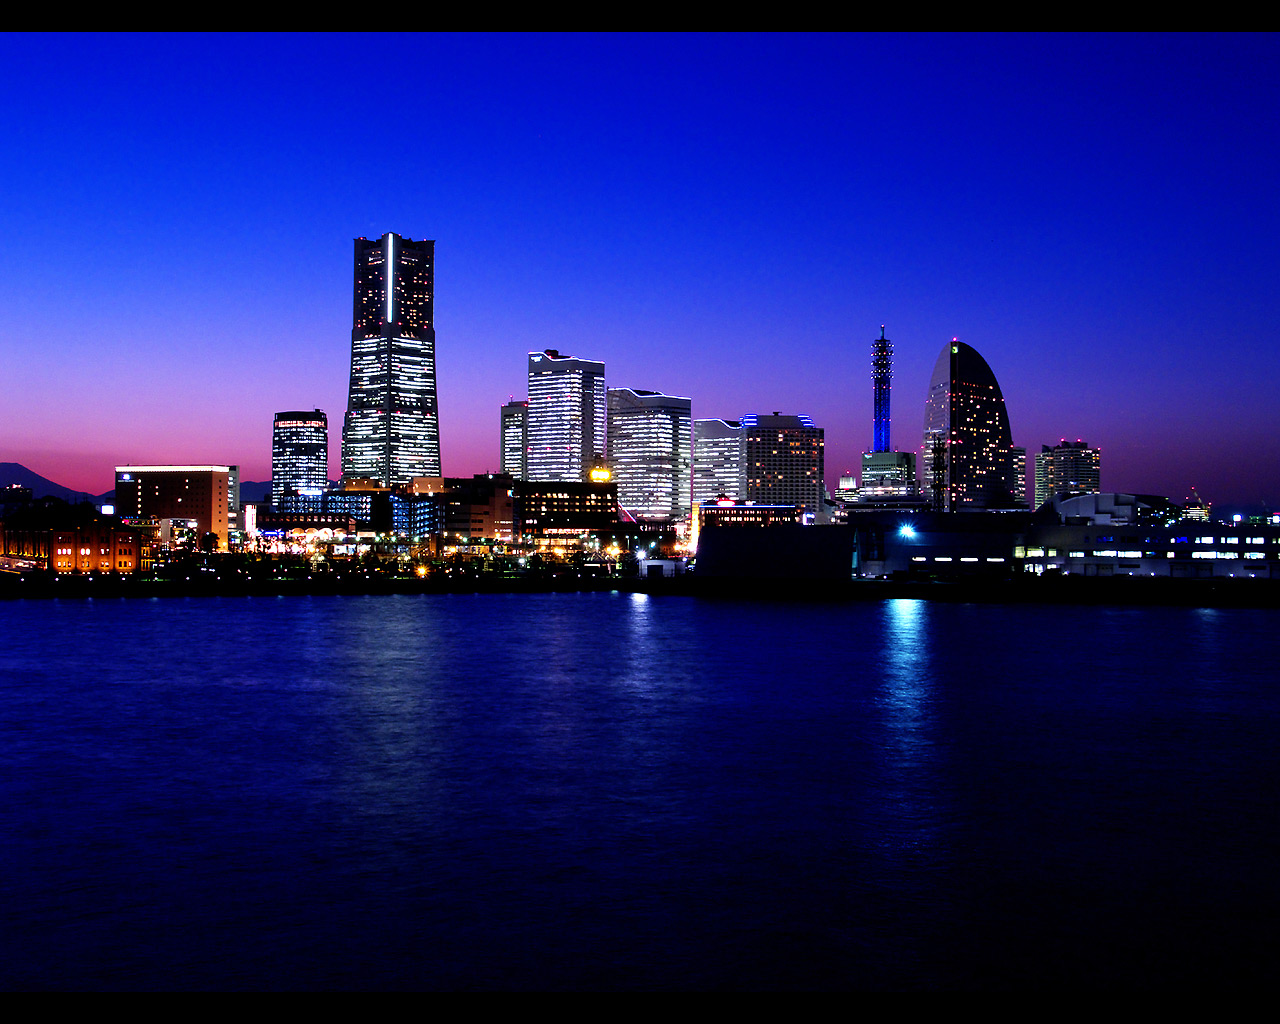 NAVER まとめ夜景の画像、写真